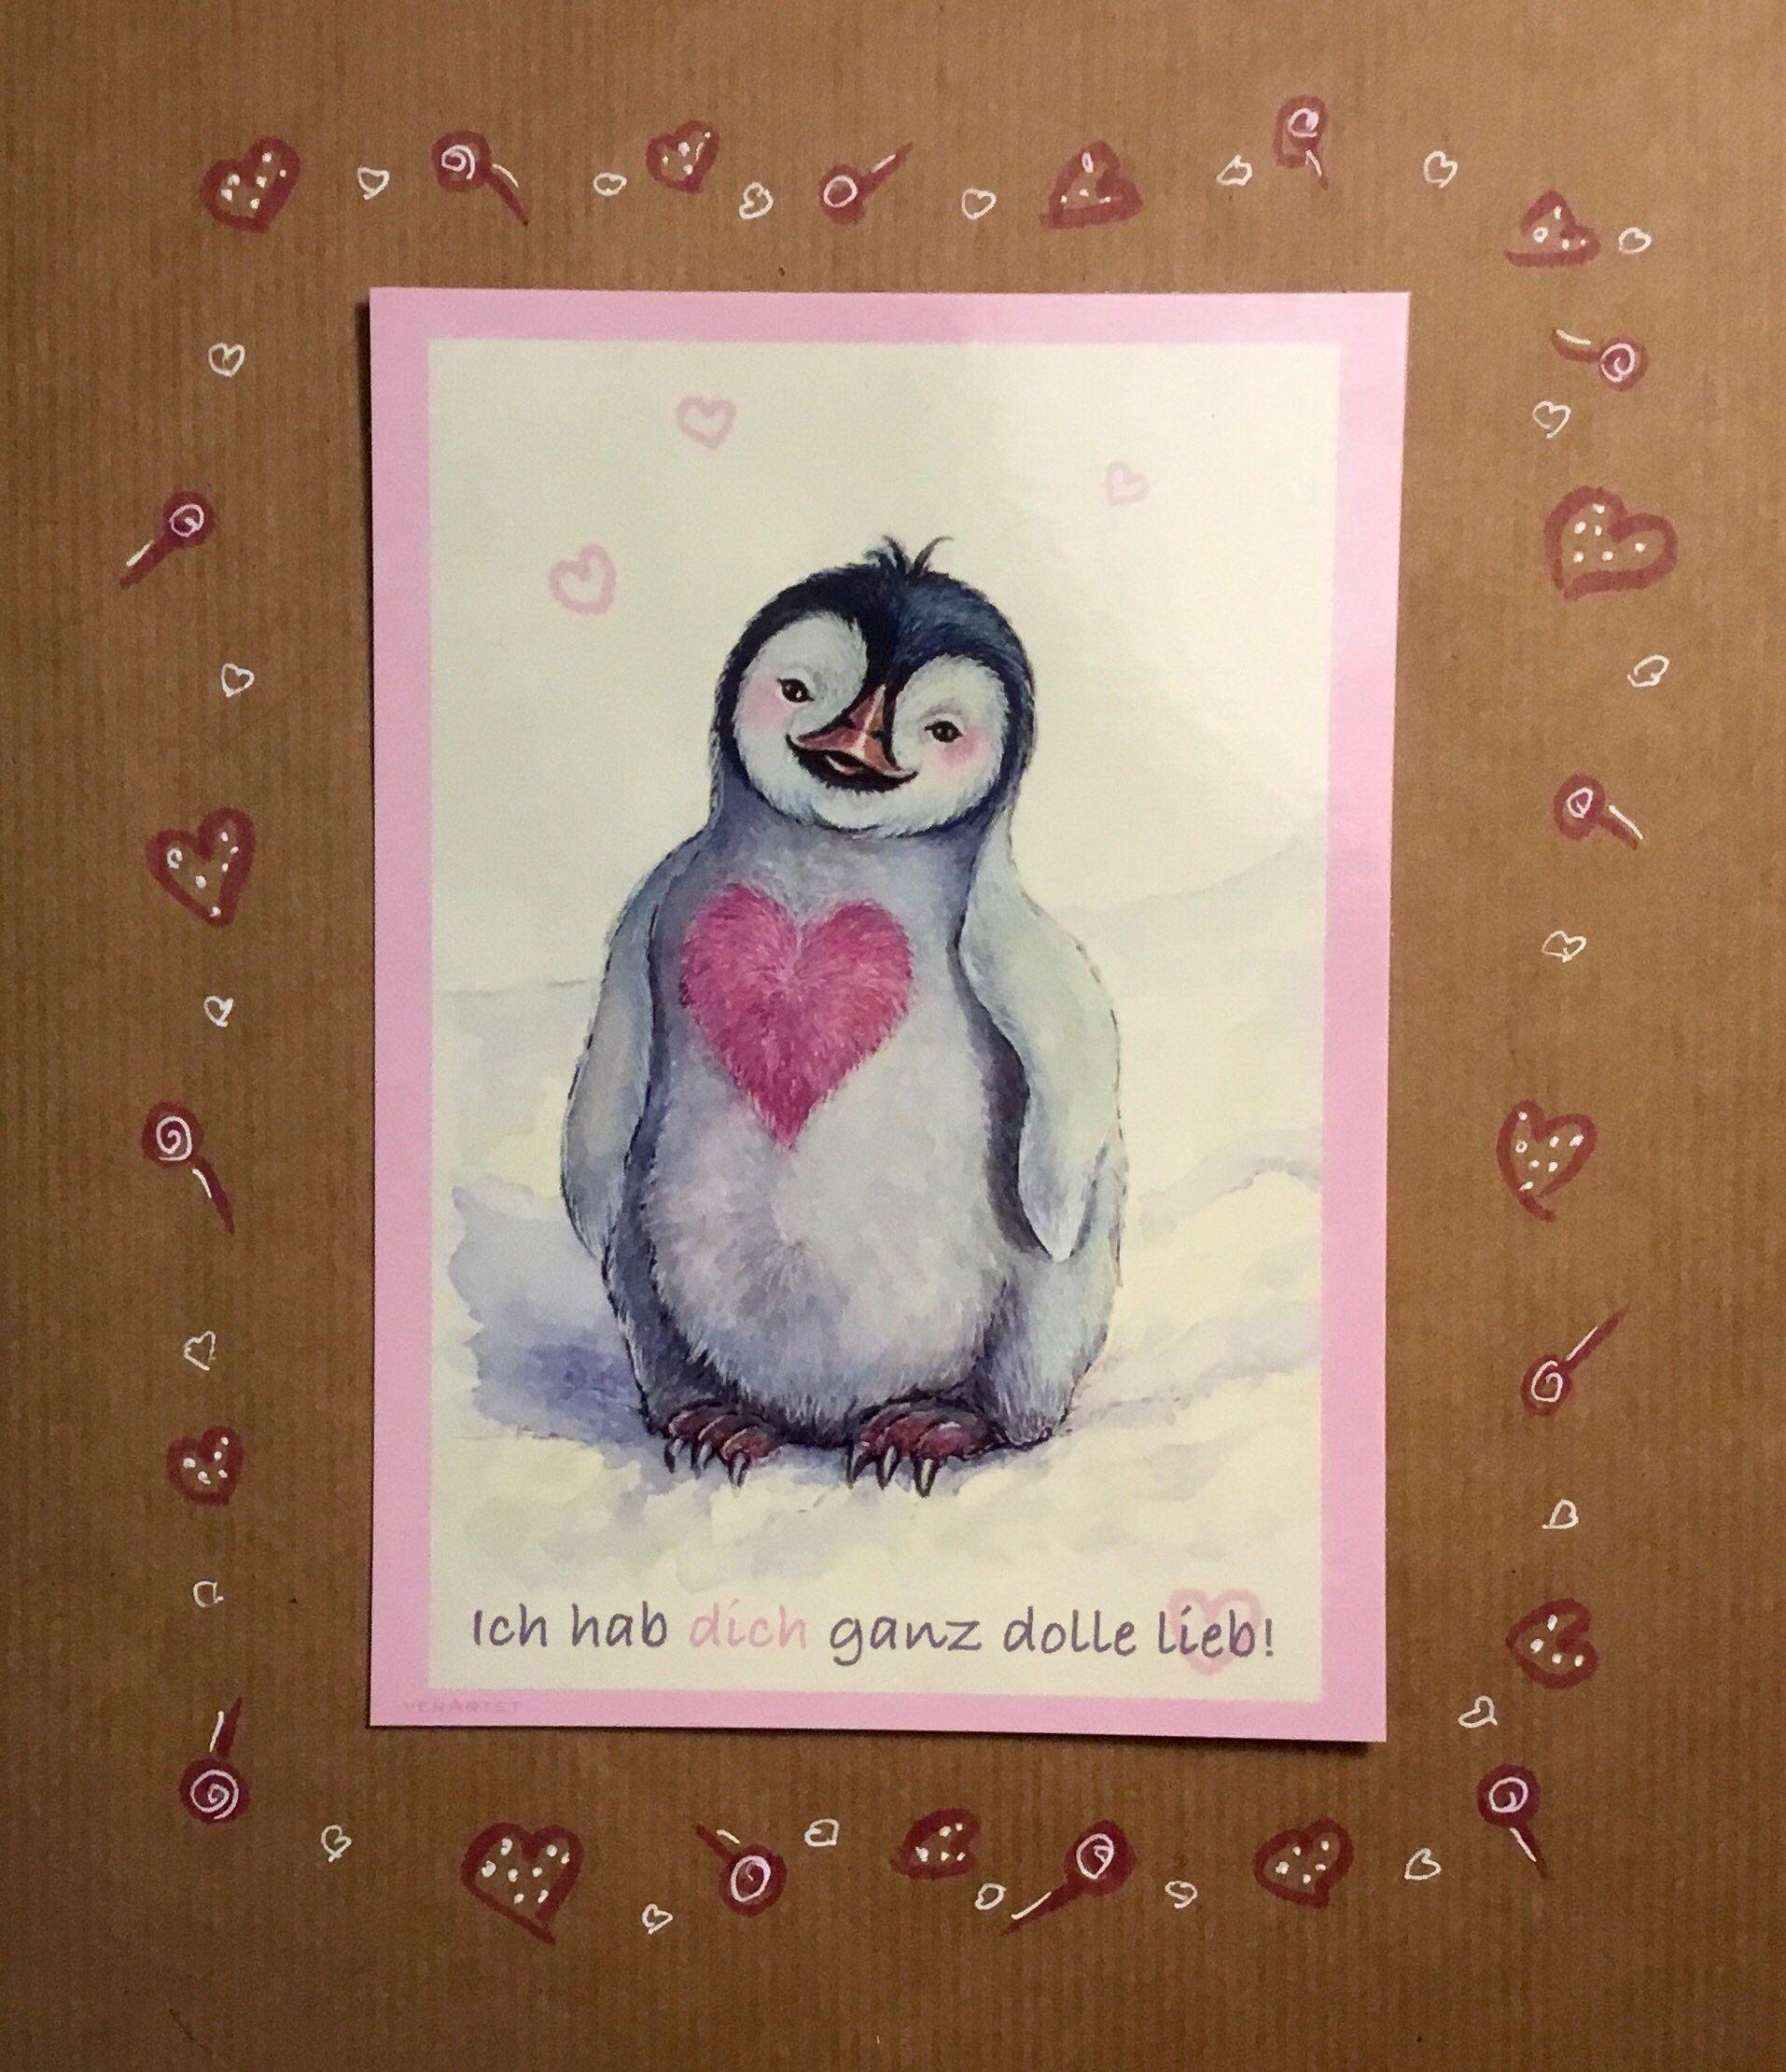 17 Ich hab dich ganz doll lieb! Postkarte von Windel Winni